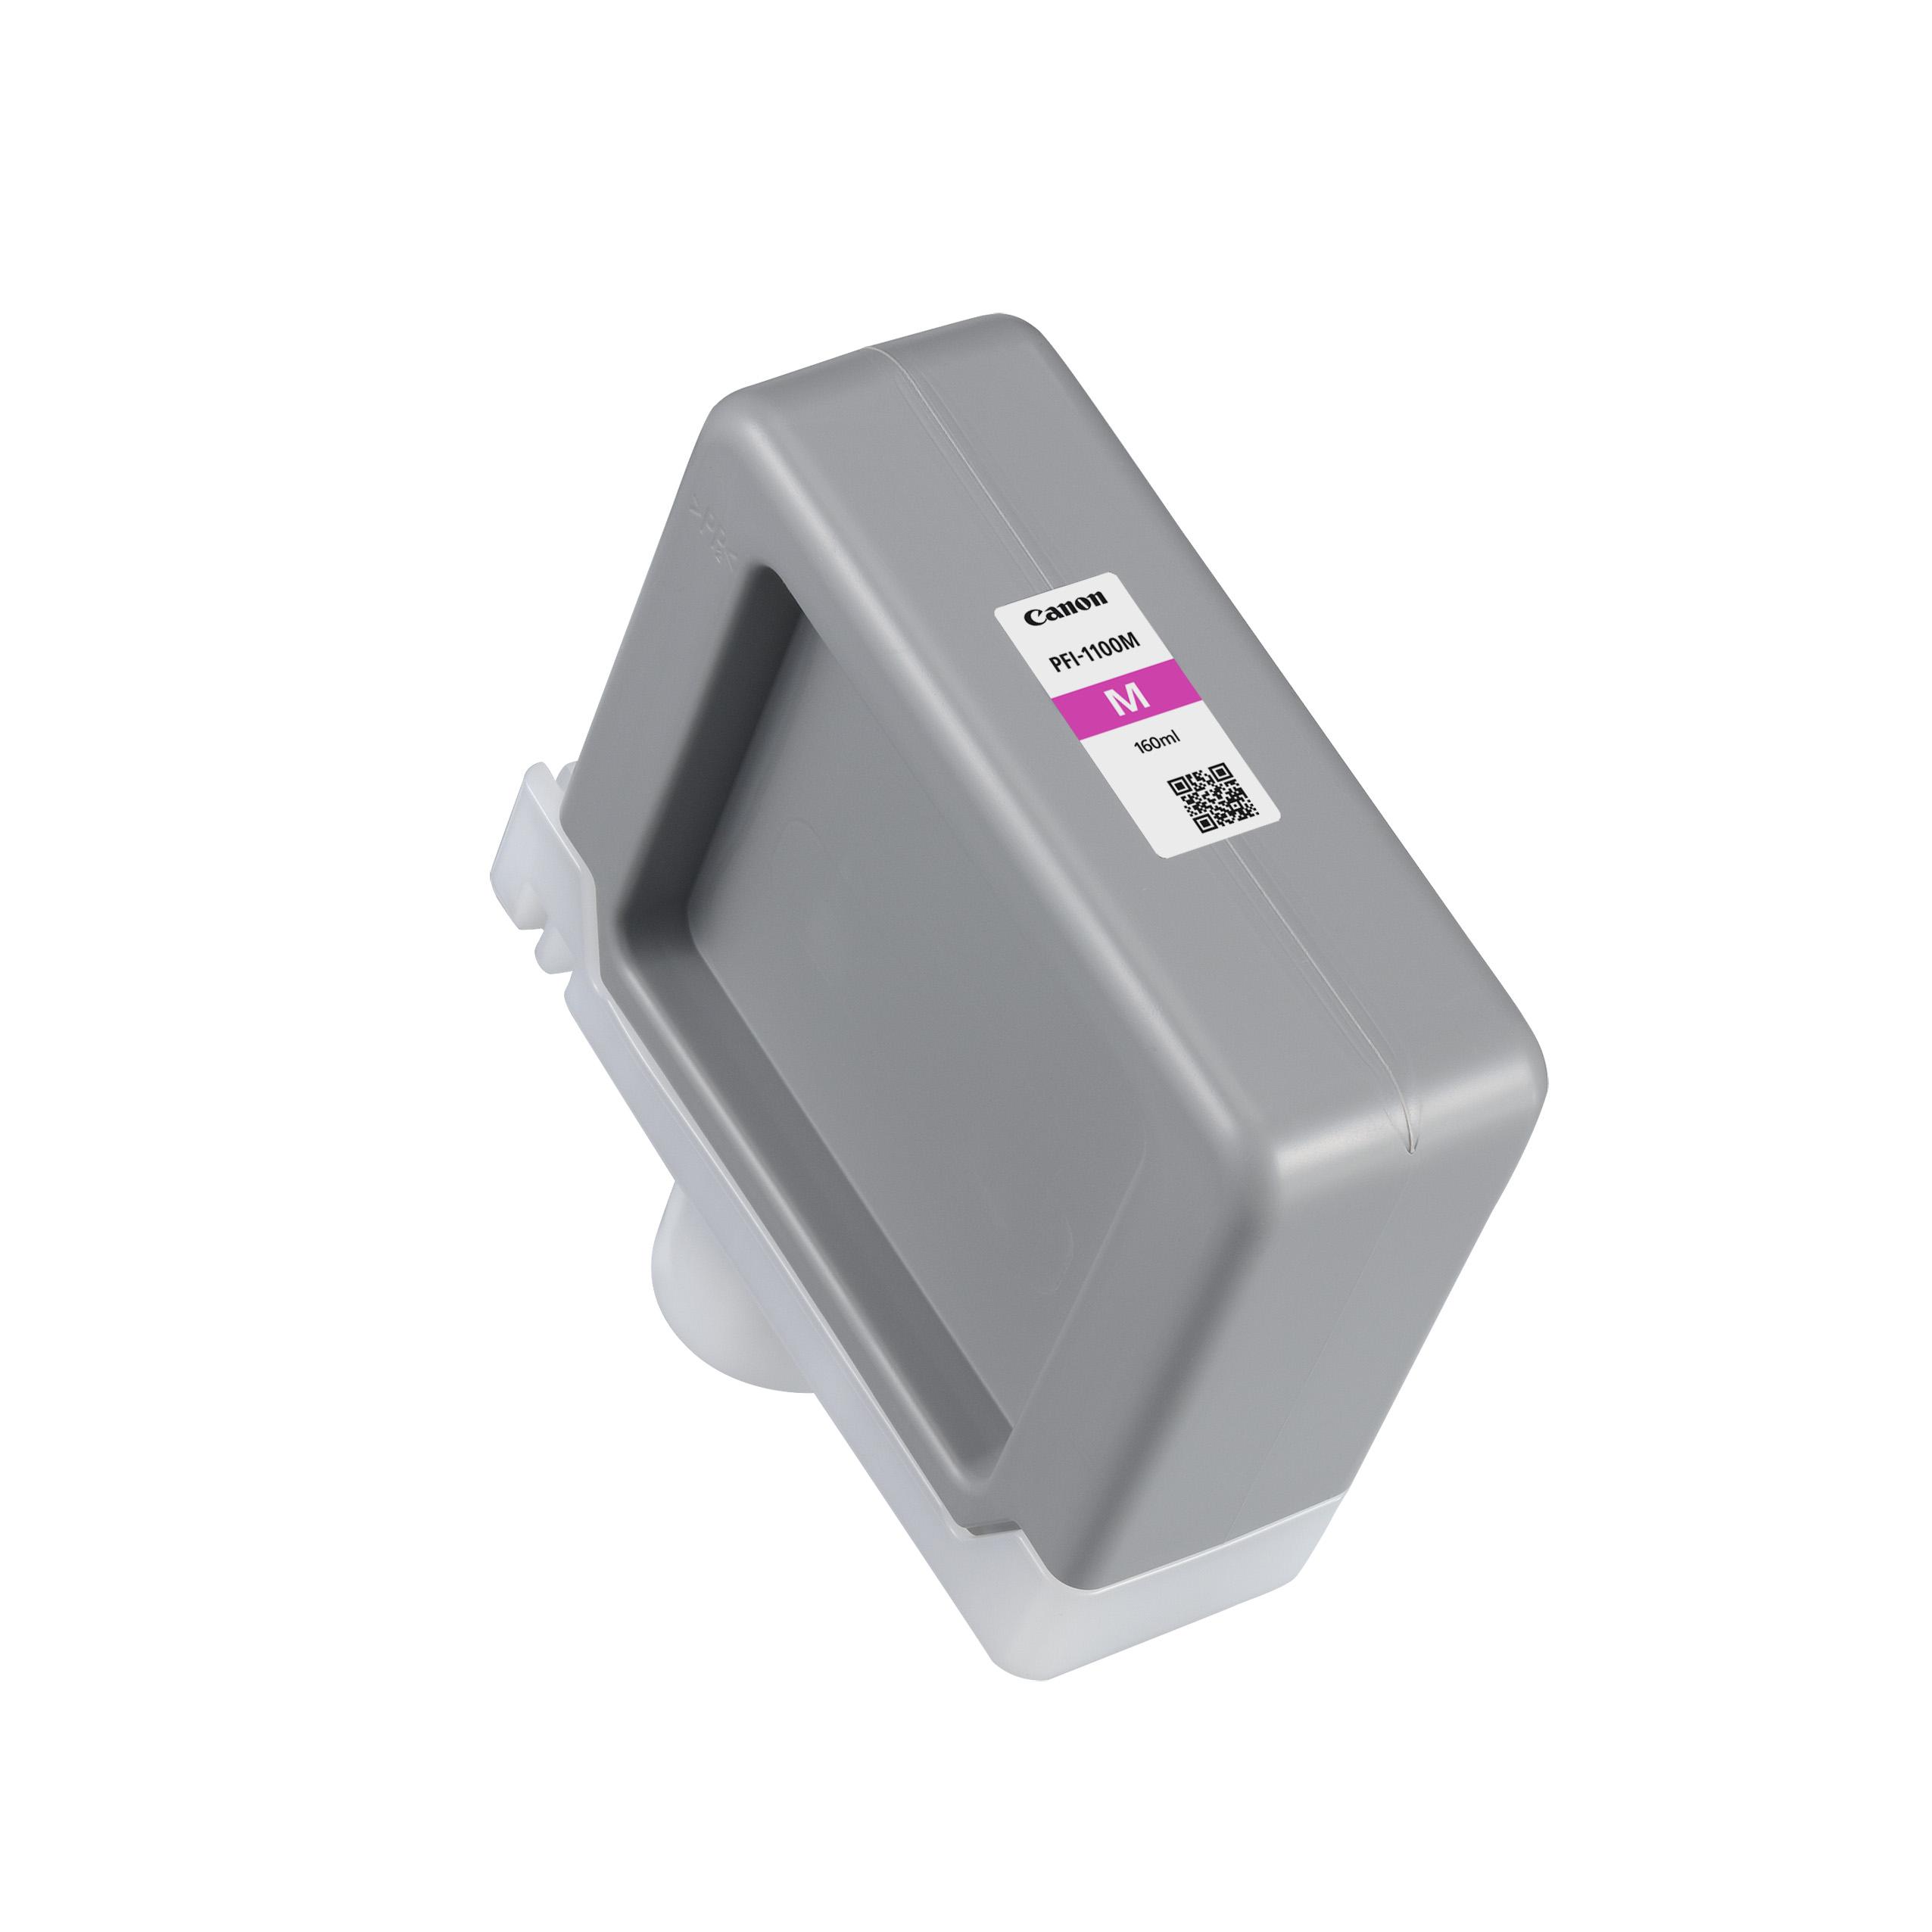 Canon PFI-1100M Magenta Ink Tank | 160ml Cartridge | for Canon PRO-2000, PRO-2100, PRO-4000S, PRO-4000, PRO-4100S, PRO-4100, PRO-6000S, PRO-6000, PRO-6100S & PRO-6100 Printers | 0852C001AA